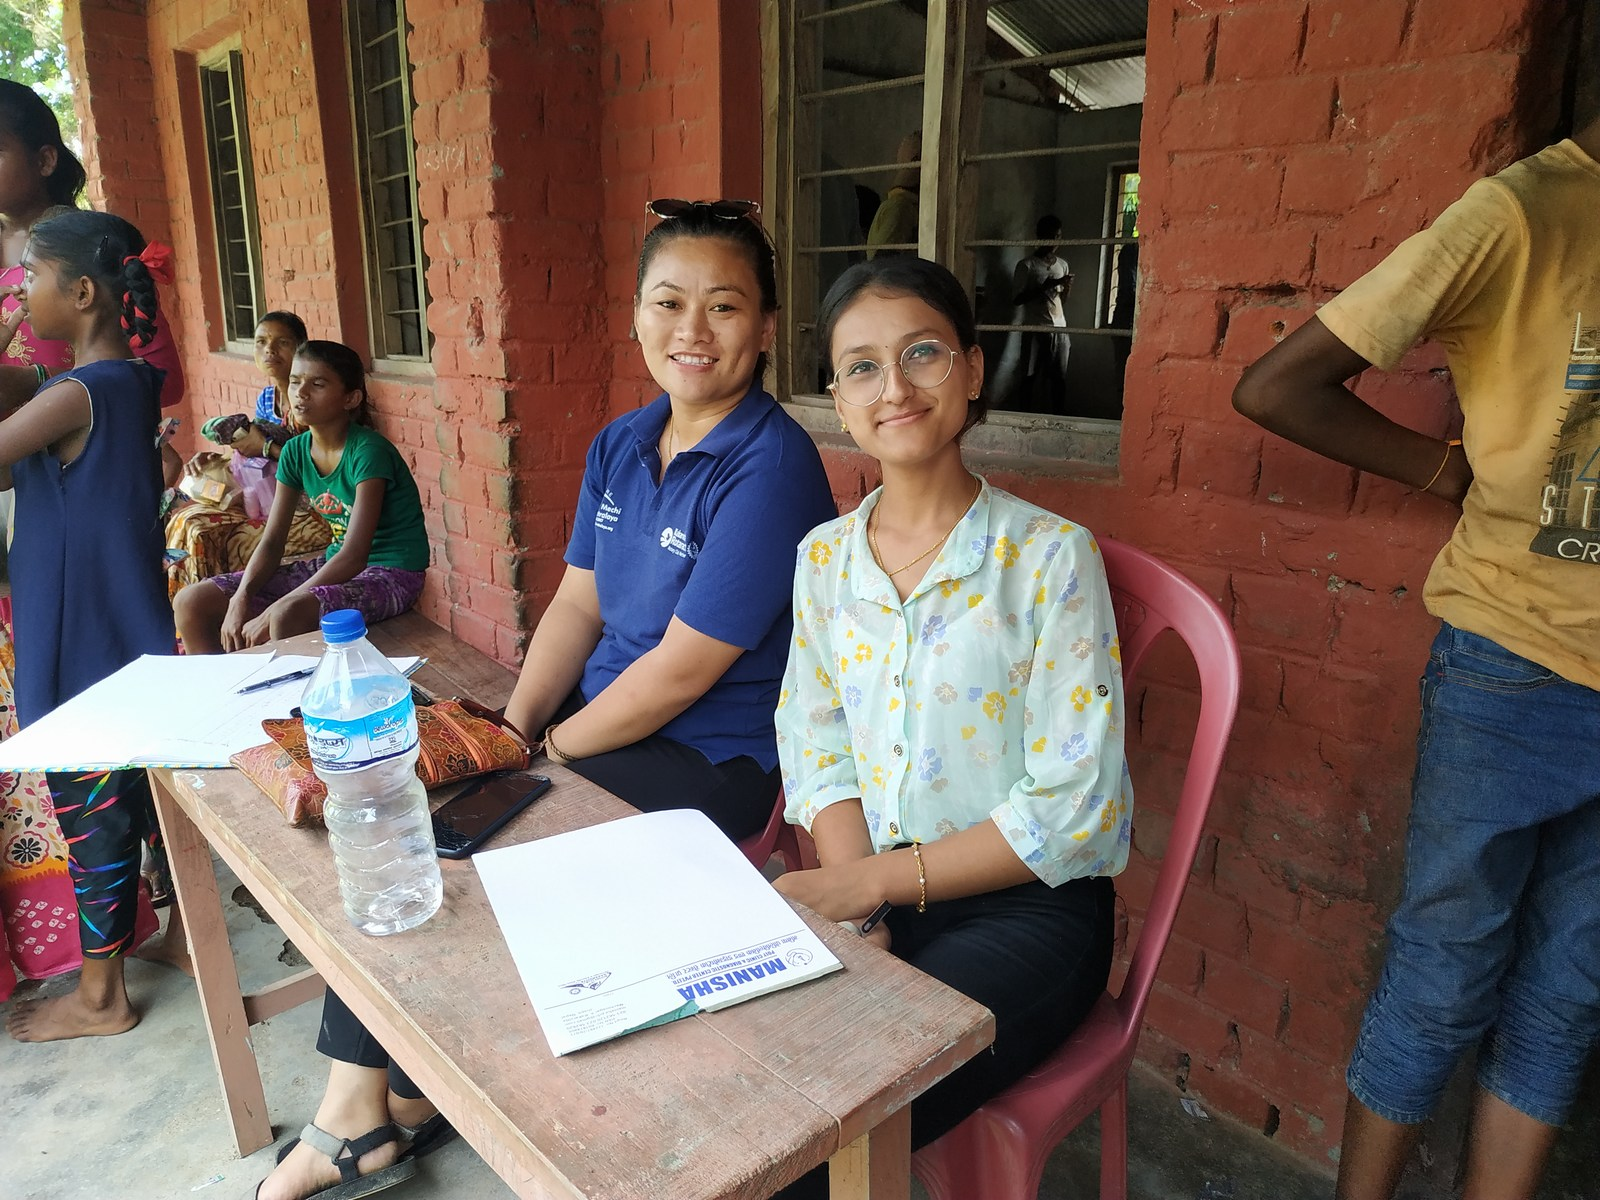 Free-Health-Camp-Eye-Screening-at-Gwala-Basti-Mechinagar-15-Jhapa-Nepal-Rotary-Club-of-Kakarvitta-38